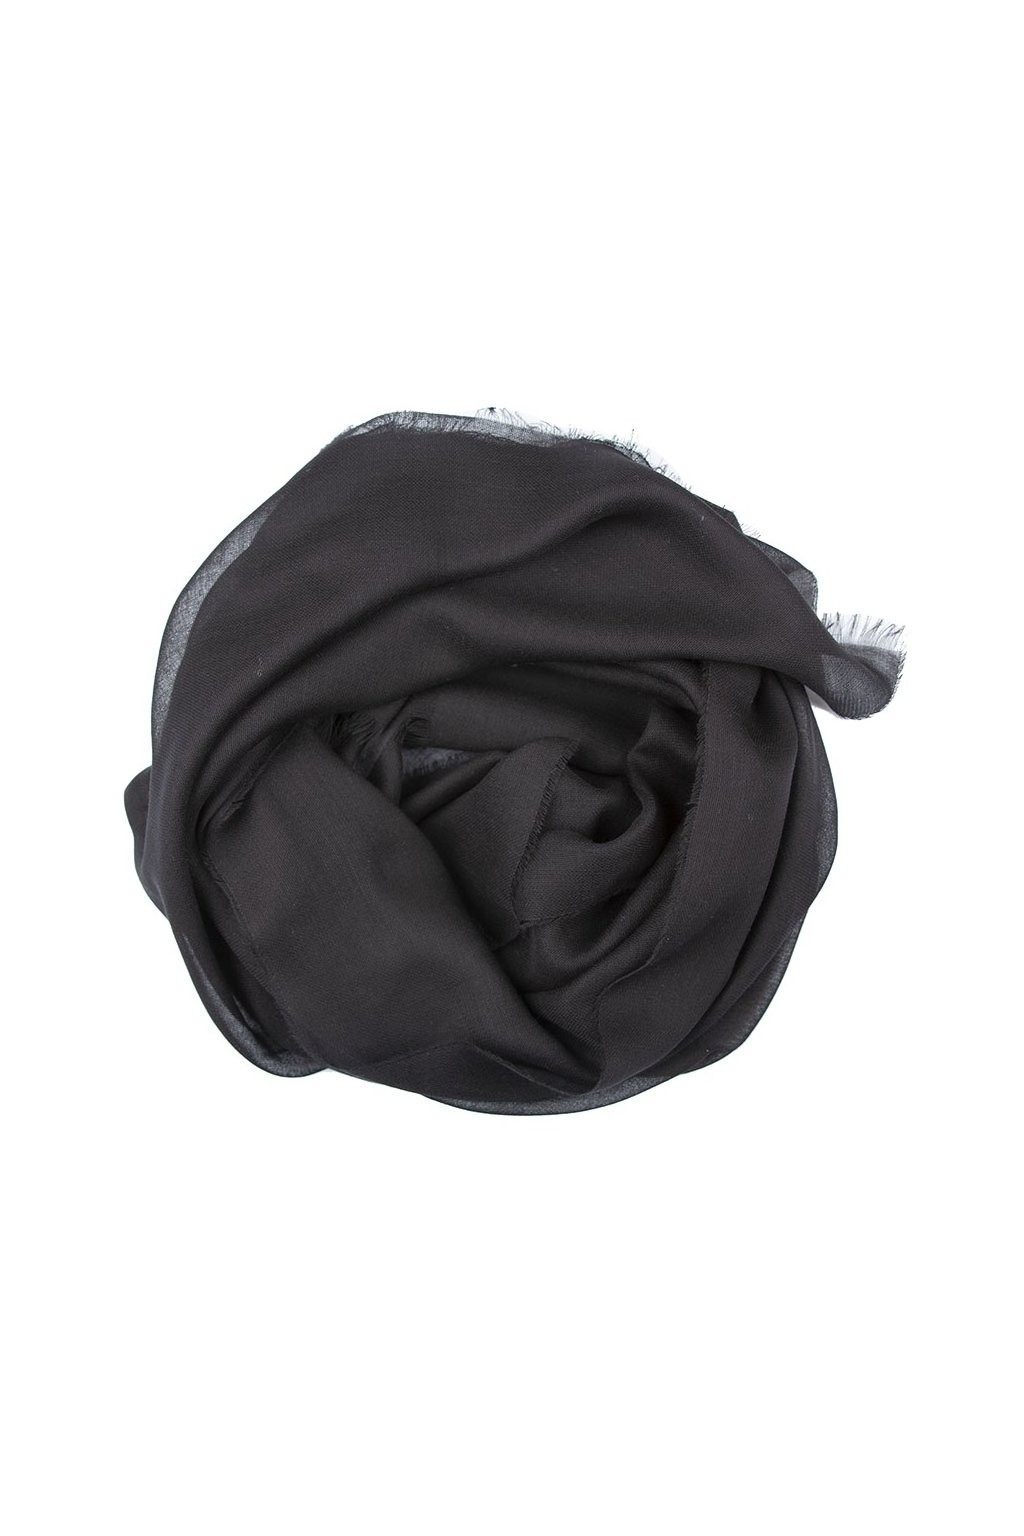 IT2168001 Soft modal cashmere black